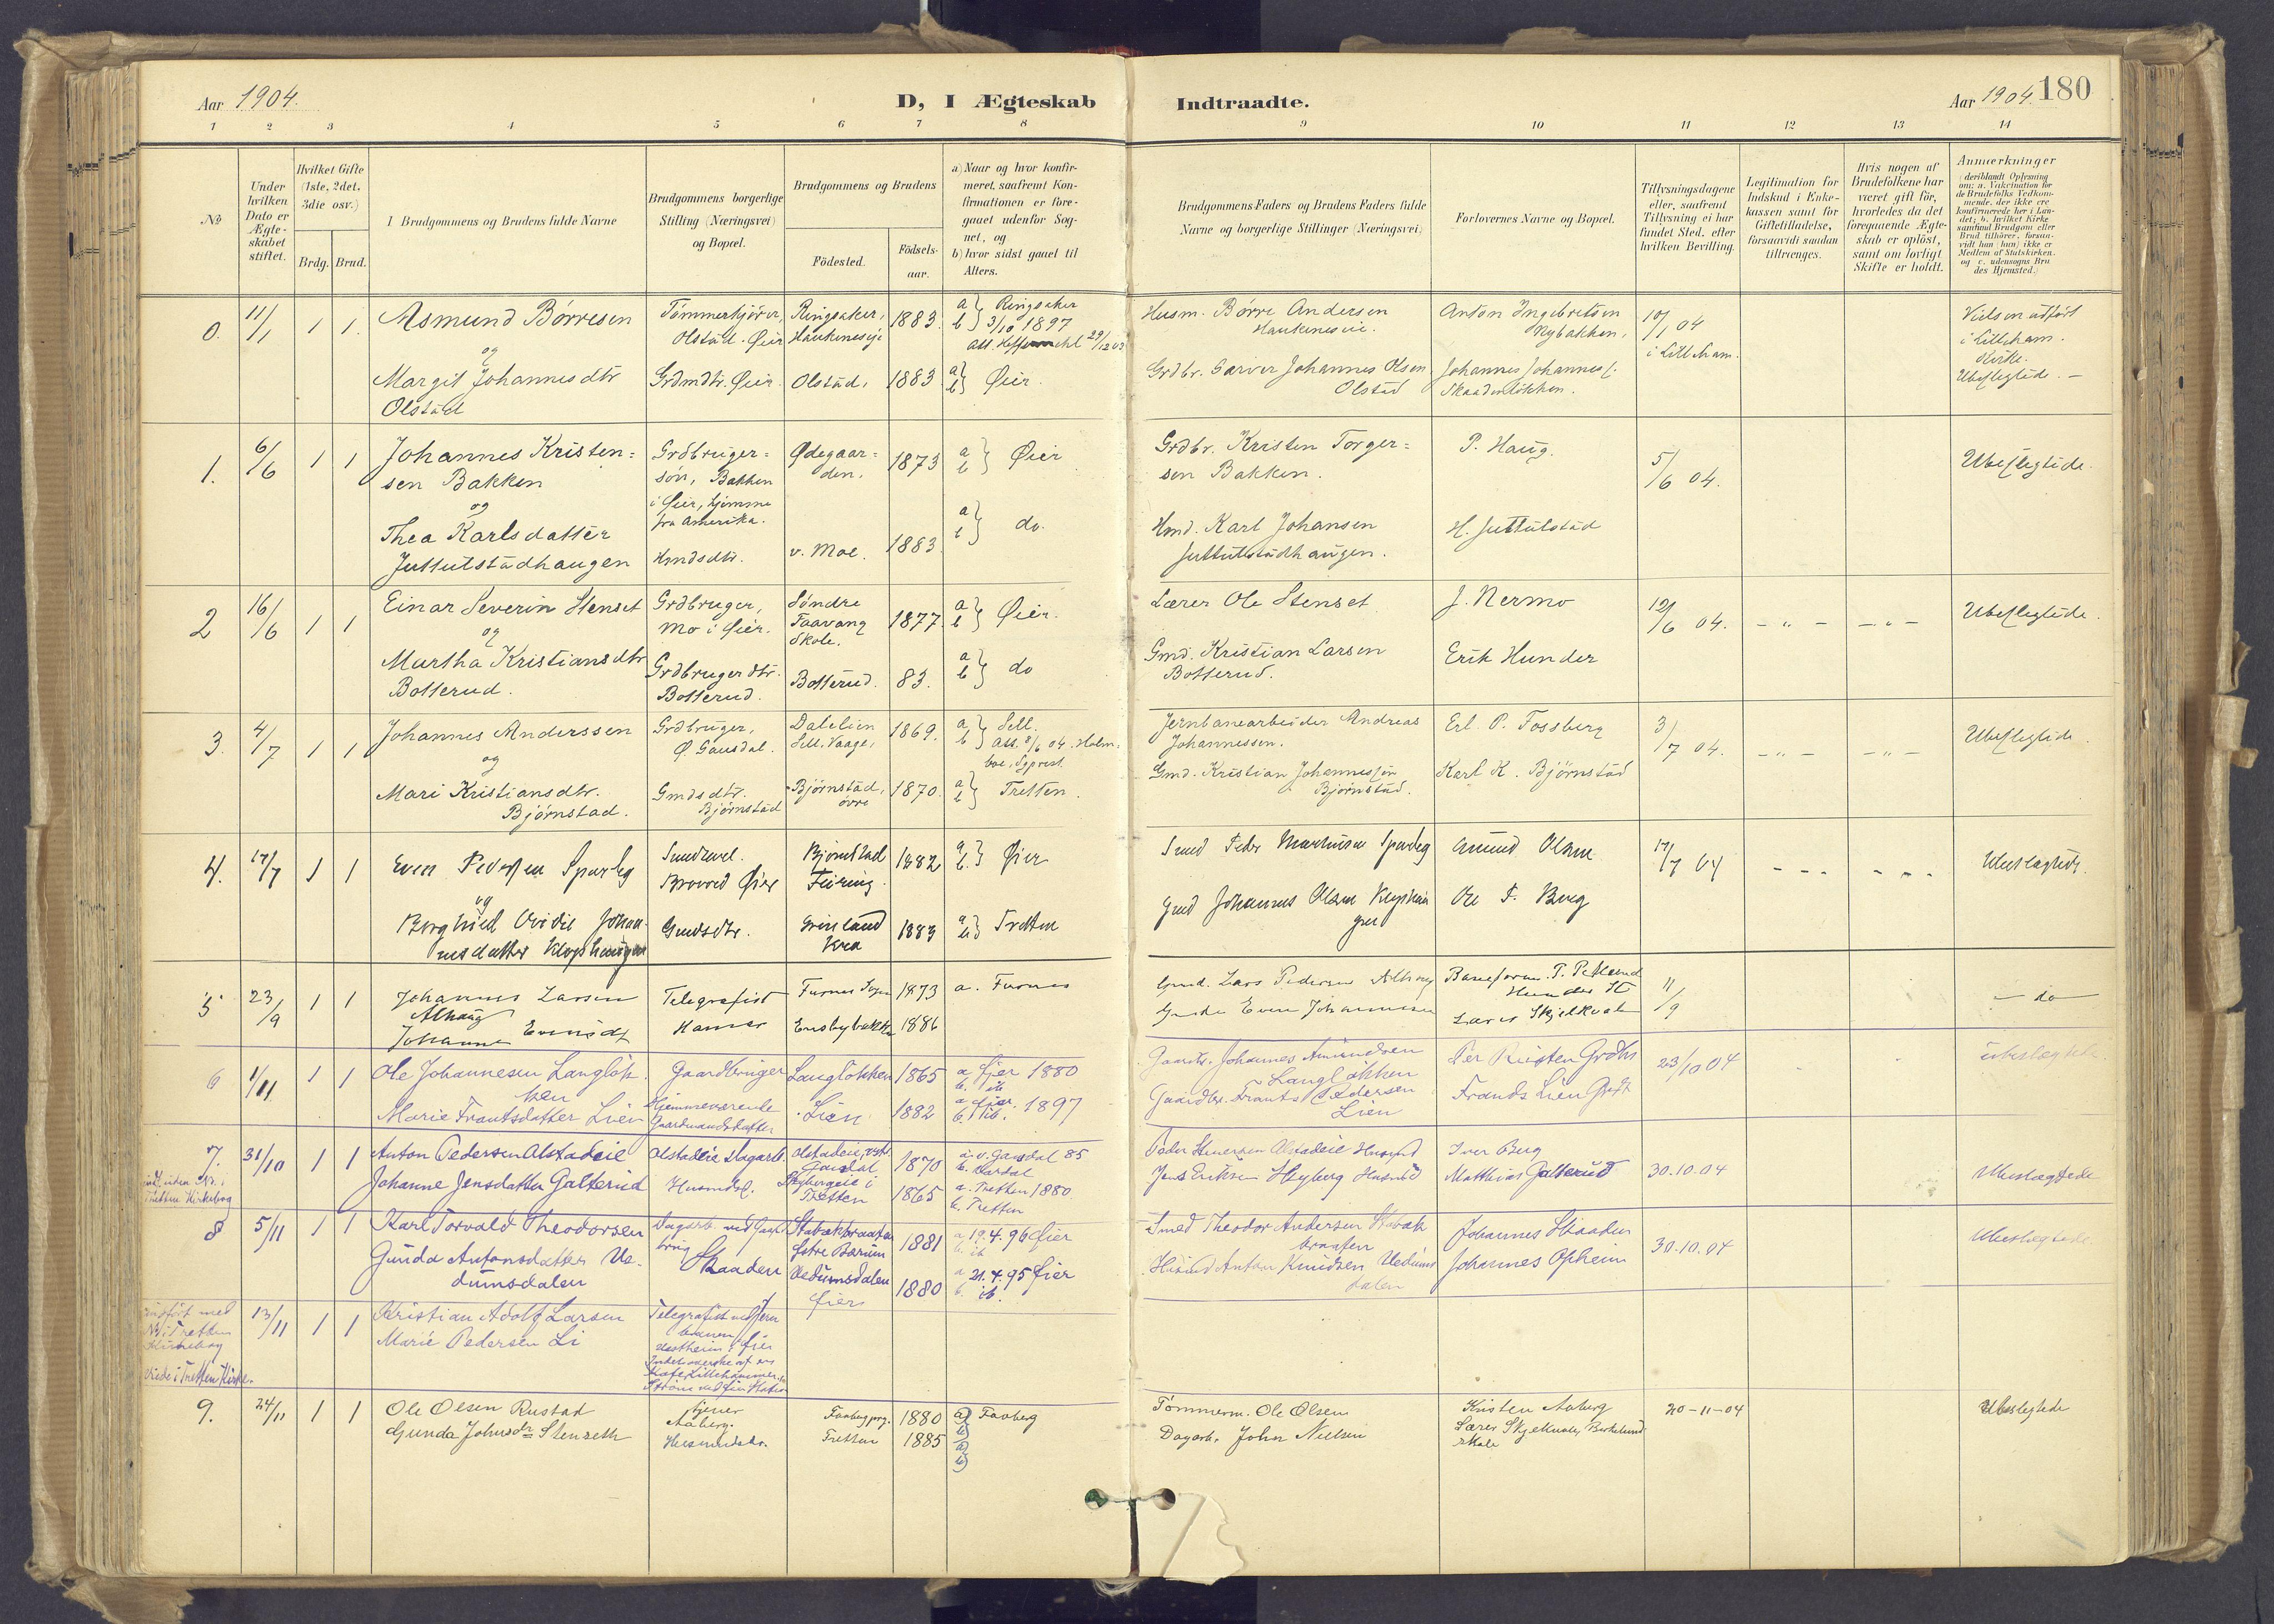 SAH, Øyer prestekontor, Ministerialbok nr. 12, 1897-1920, s. 180